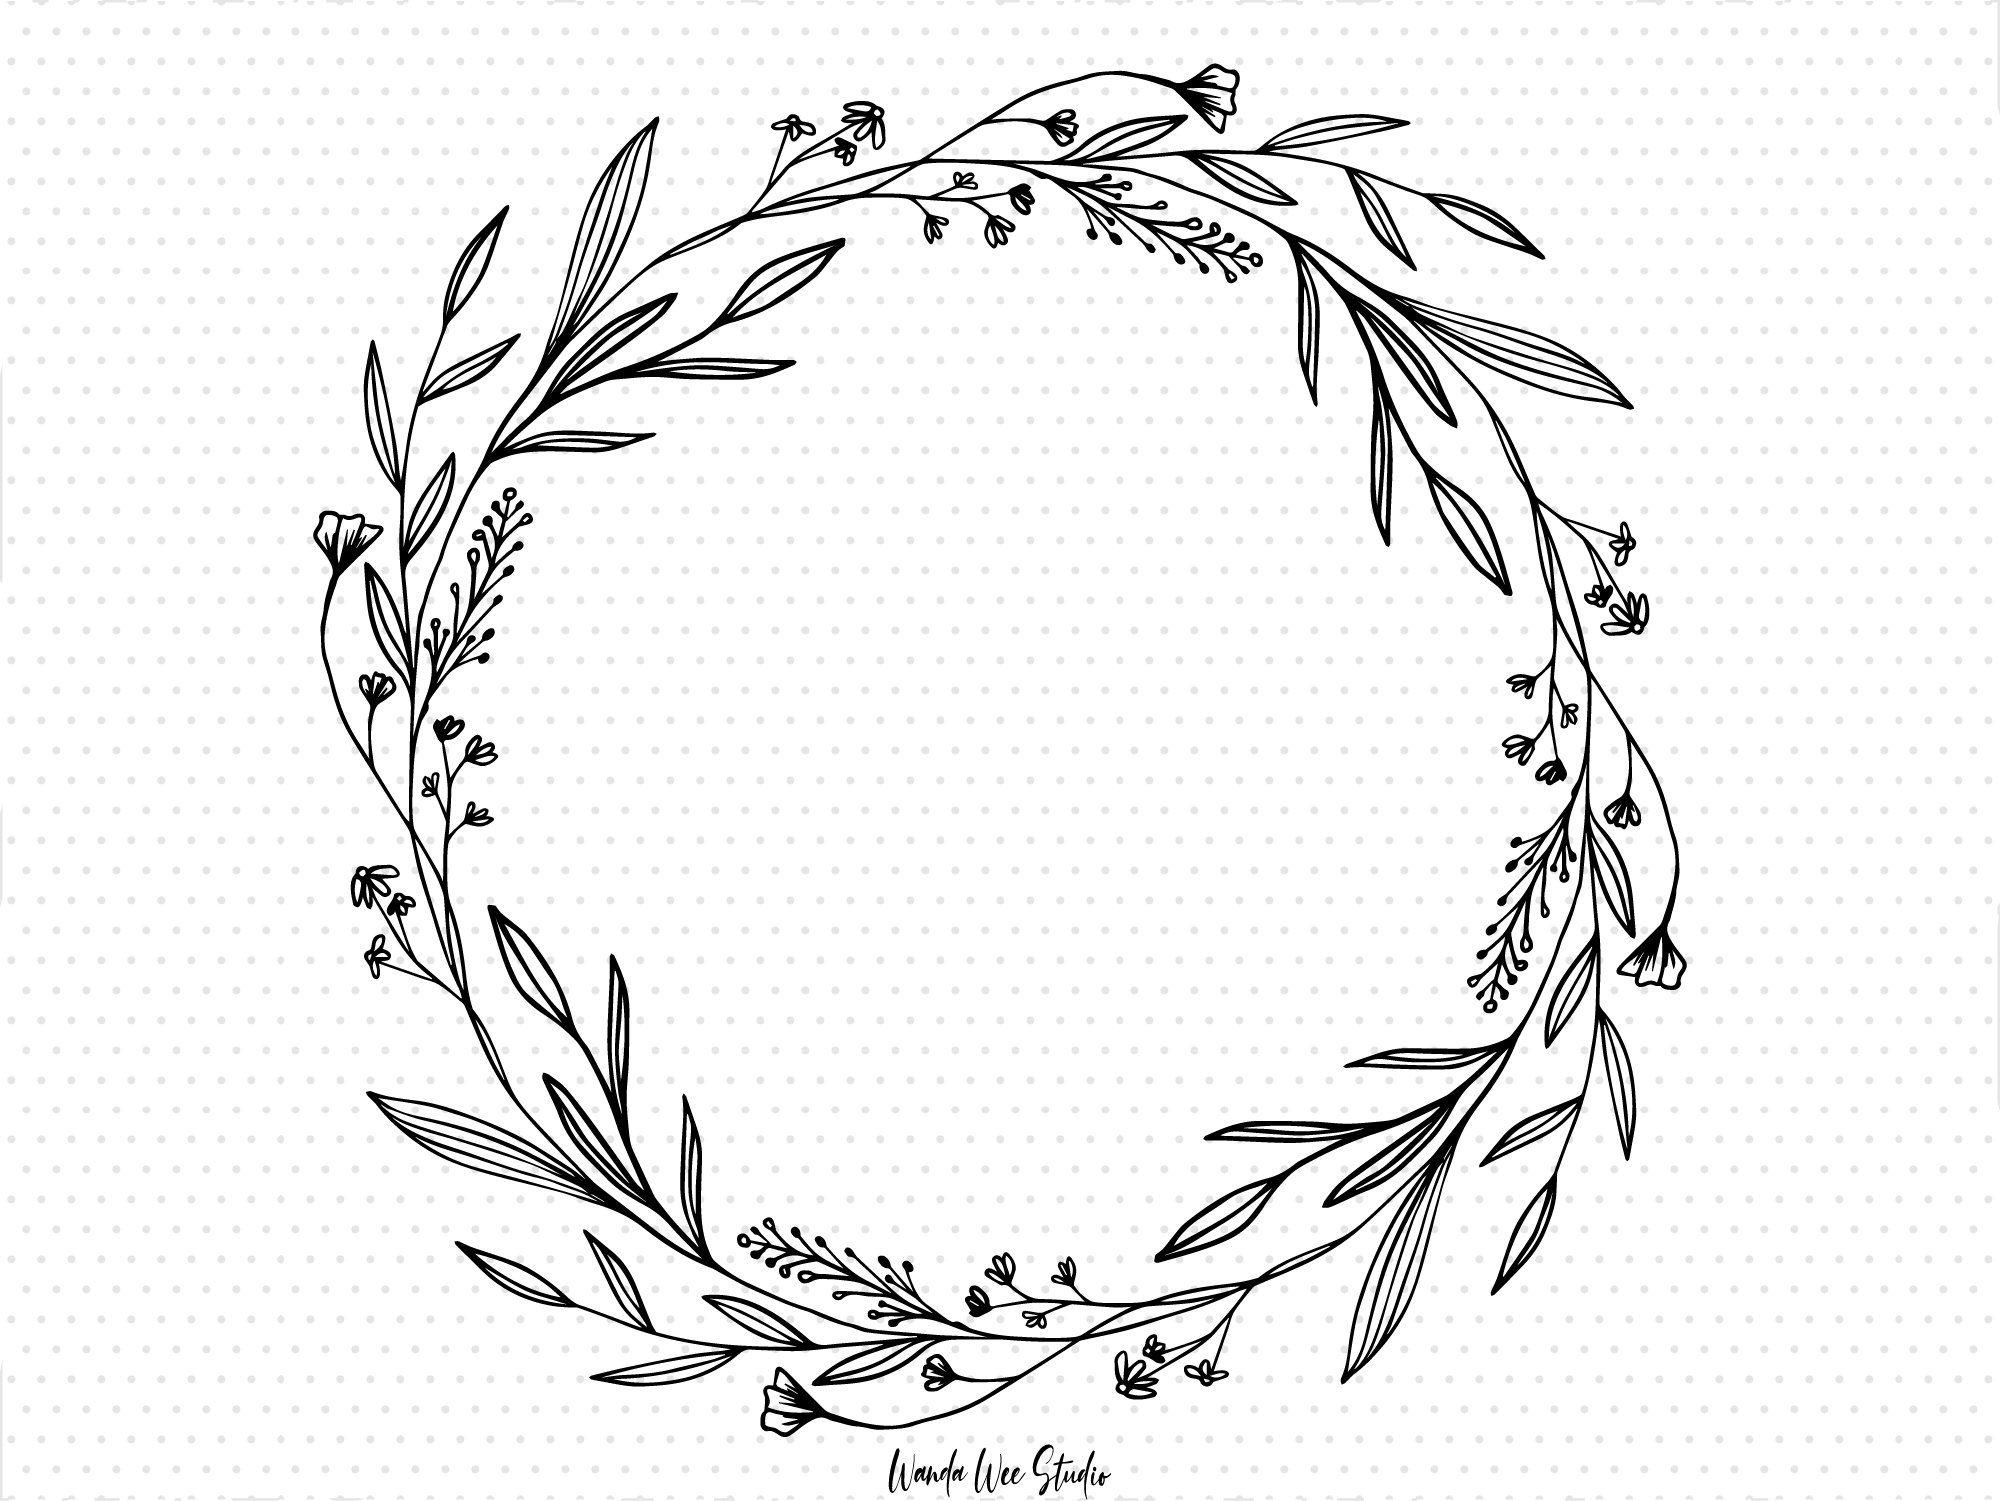 Hand Drawing Foliage Leaf Wreath Monochrome Wreath Clip Art Png File For Sublimation Home Project And Hand Lettering Decoration Wreath Clip Art Floral Wreaths Illustration Floral Border Design